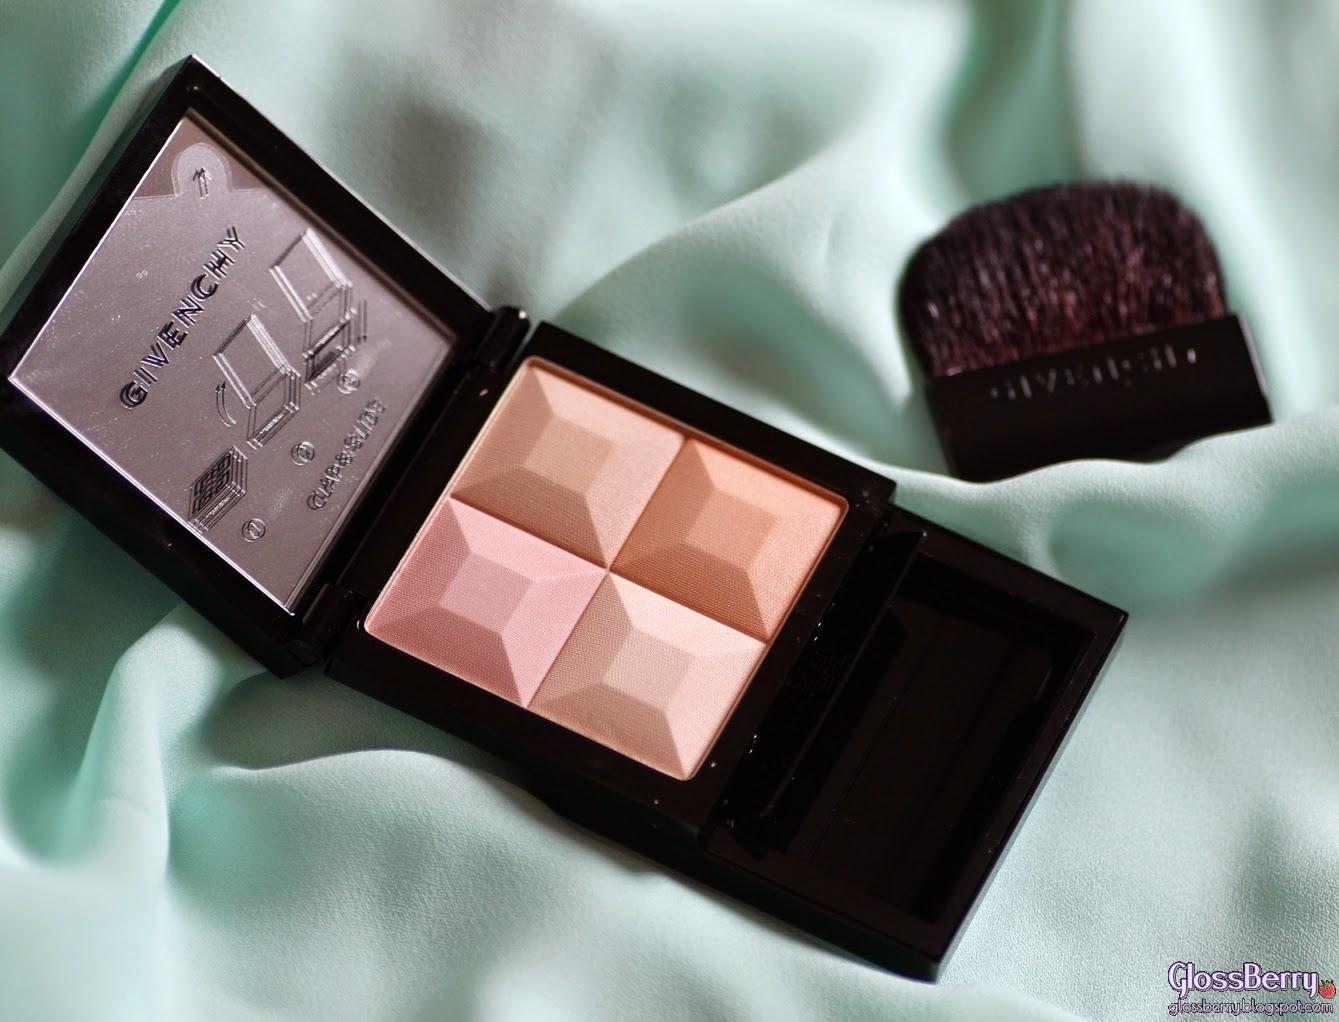 Givenchy - Le Prisme Visage Mat Soft Compact Face Powder review swatches 83 peach פודרה ג'יבנשי גיבנשי סקירה בלוג איפור וטיפוח המלצות עור יבש גלוסברי